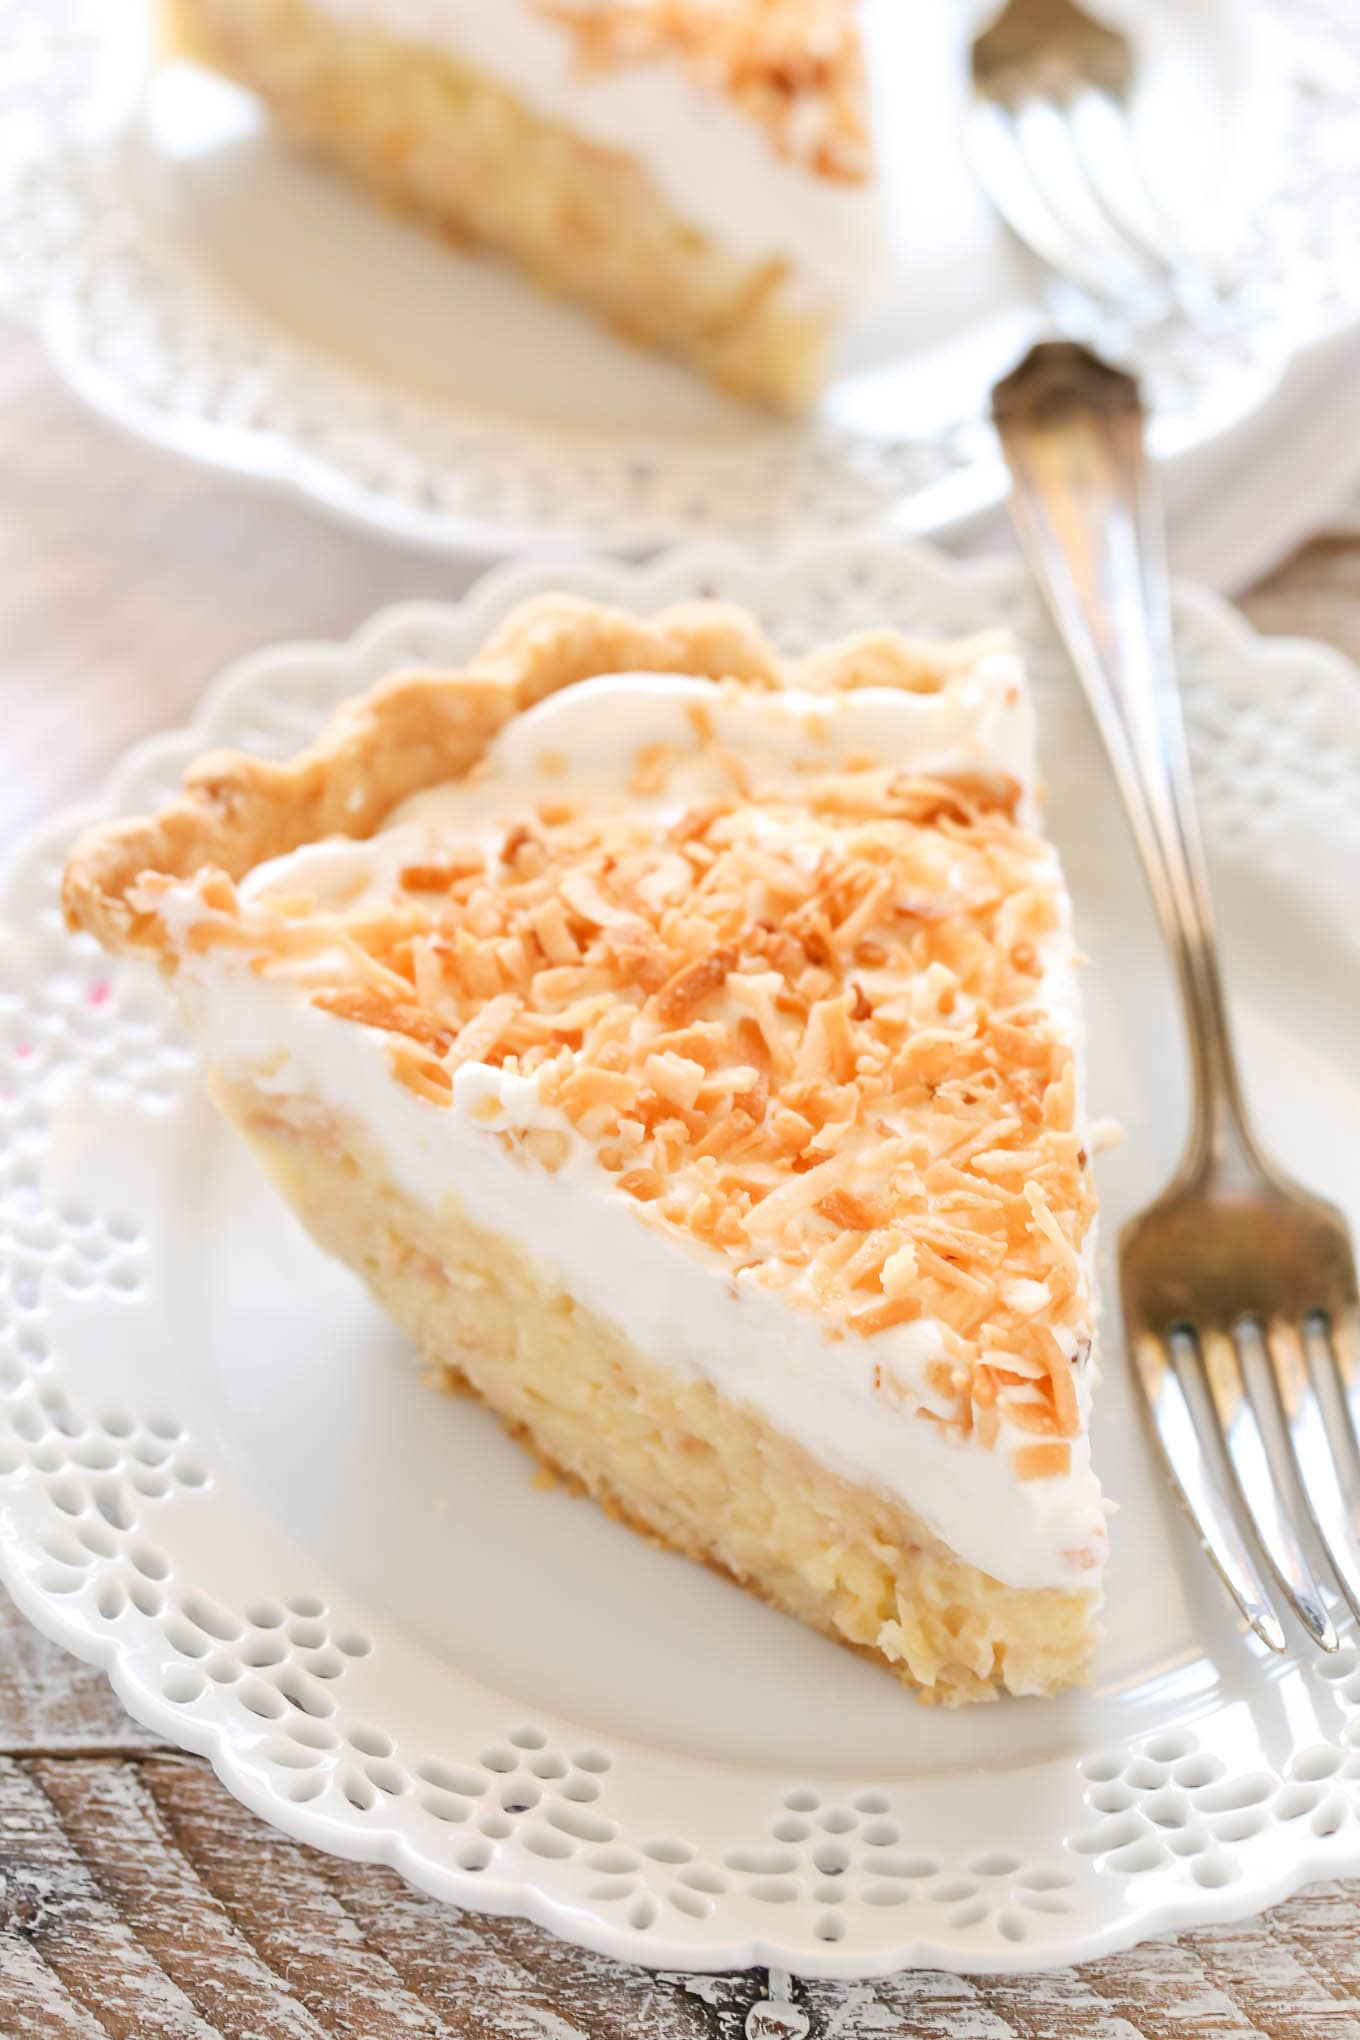 bangs Cream pie gang